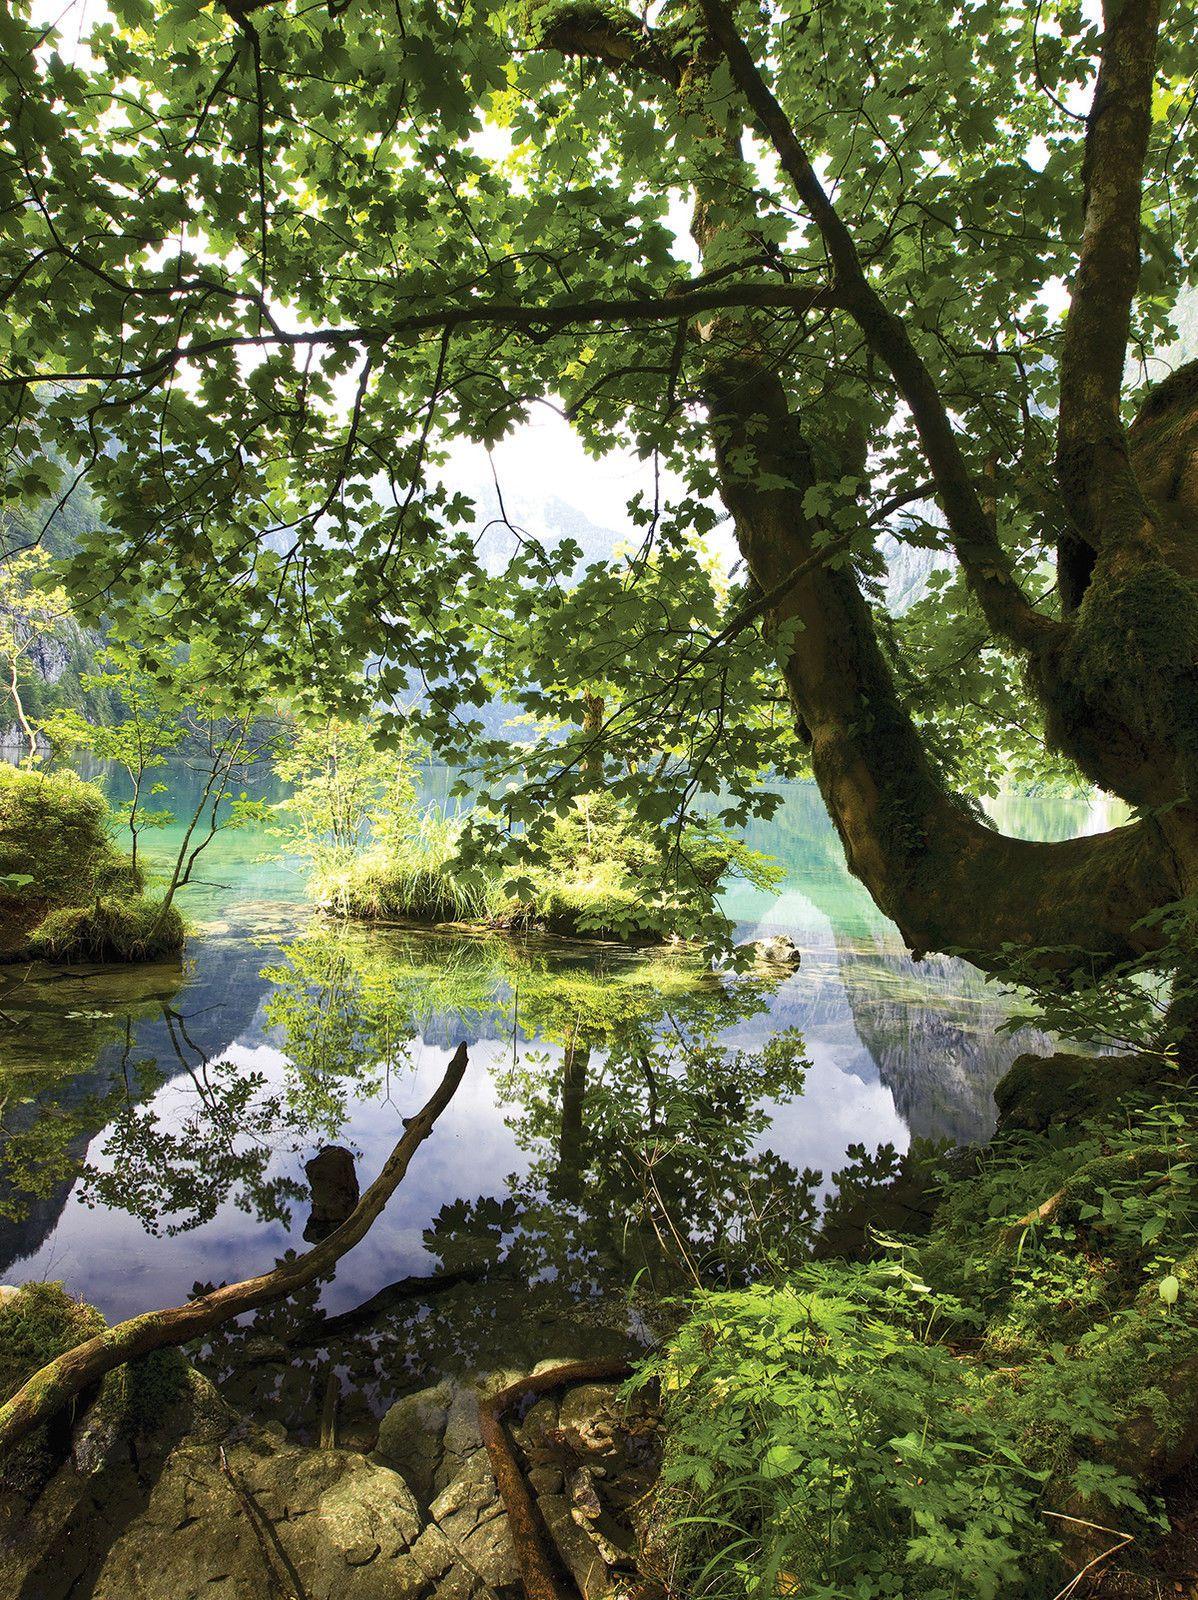 Jugendzimmer Wald | Fototapete Fototapete Tapete Tapeten Poster Pflanzen Natur Wasser